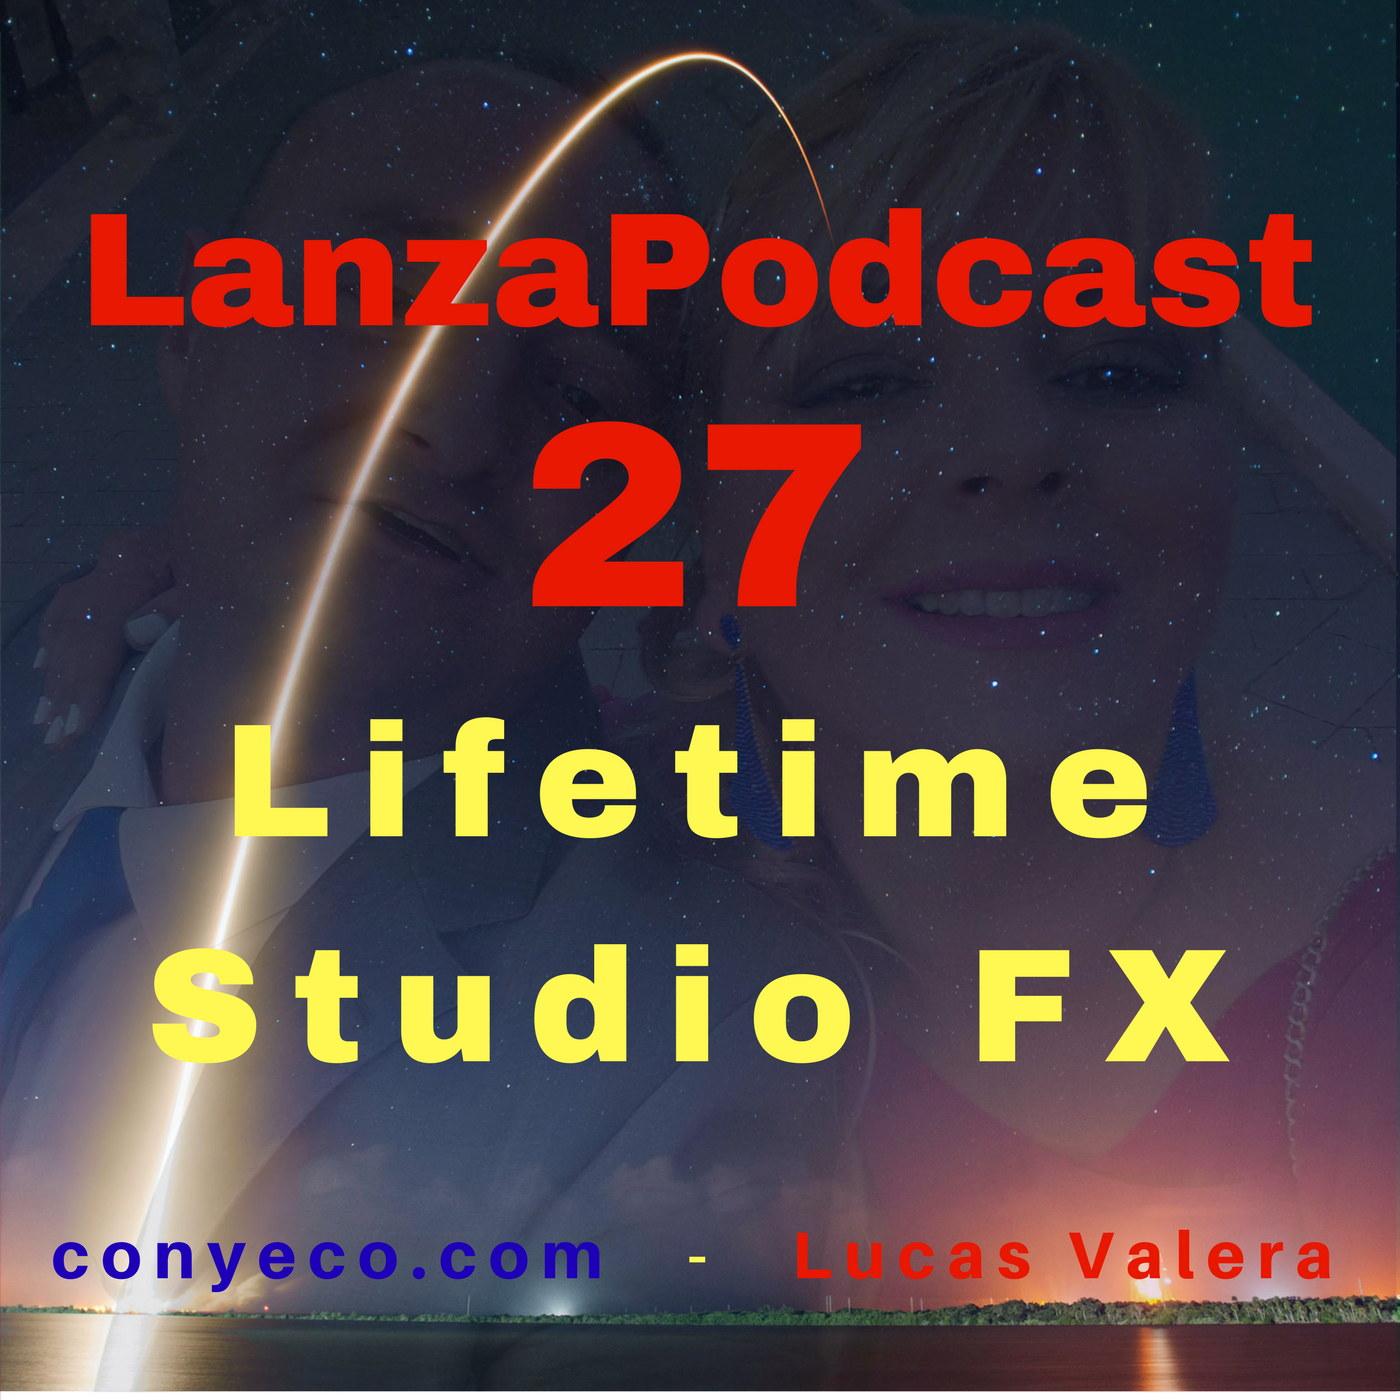 LanzaPodcast-27-Lifetime-Studio-FX-conyeco.com-Lucas-Valera